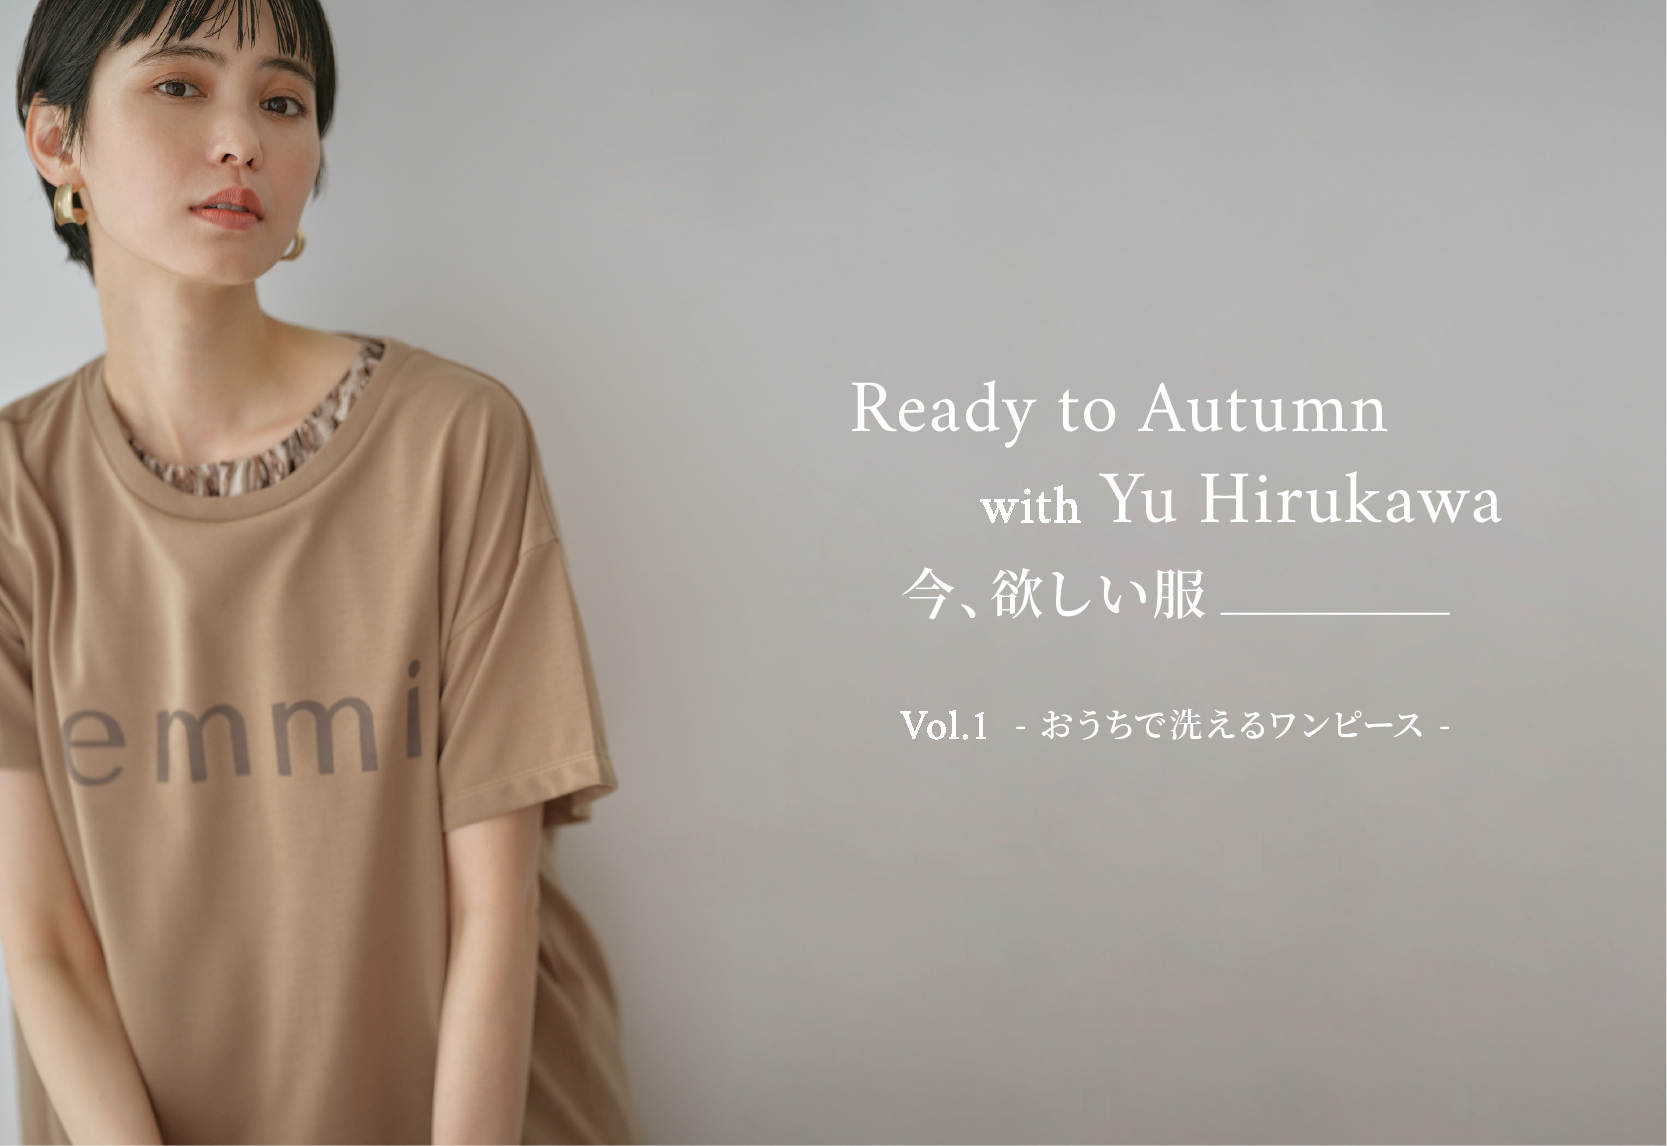 Ready to Autumn with Yu Hirukawa